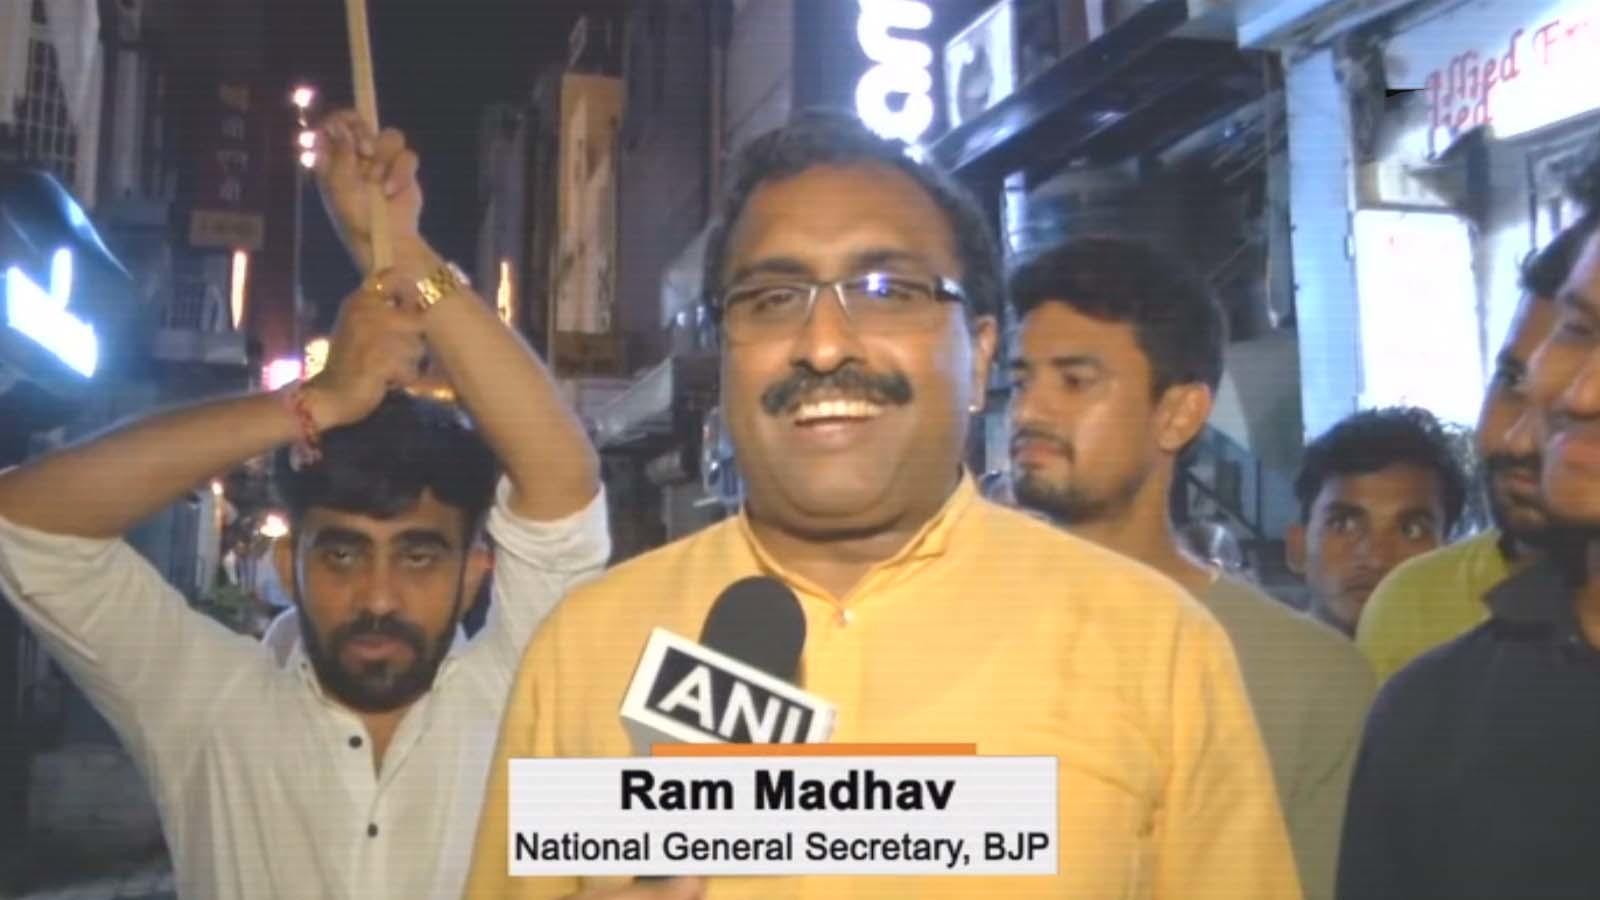 ram-madhav-celebrates-bjp-victory-in-delhis-khan-market